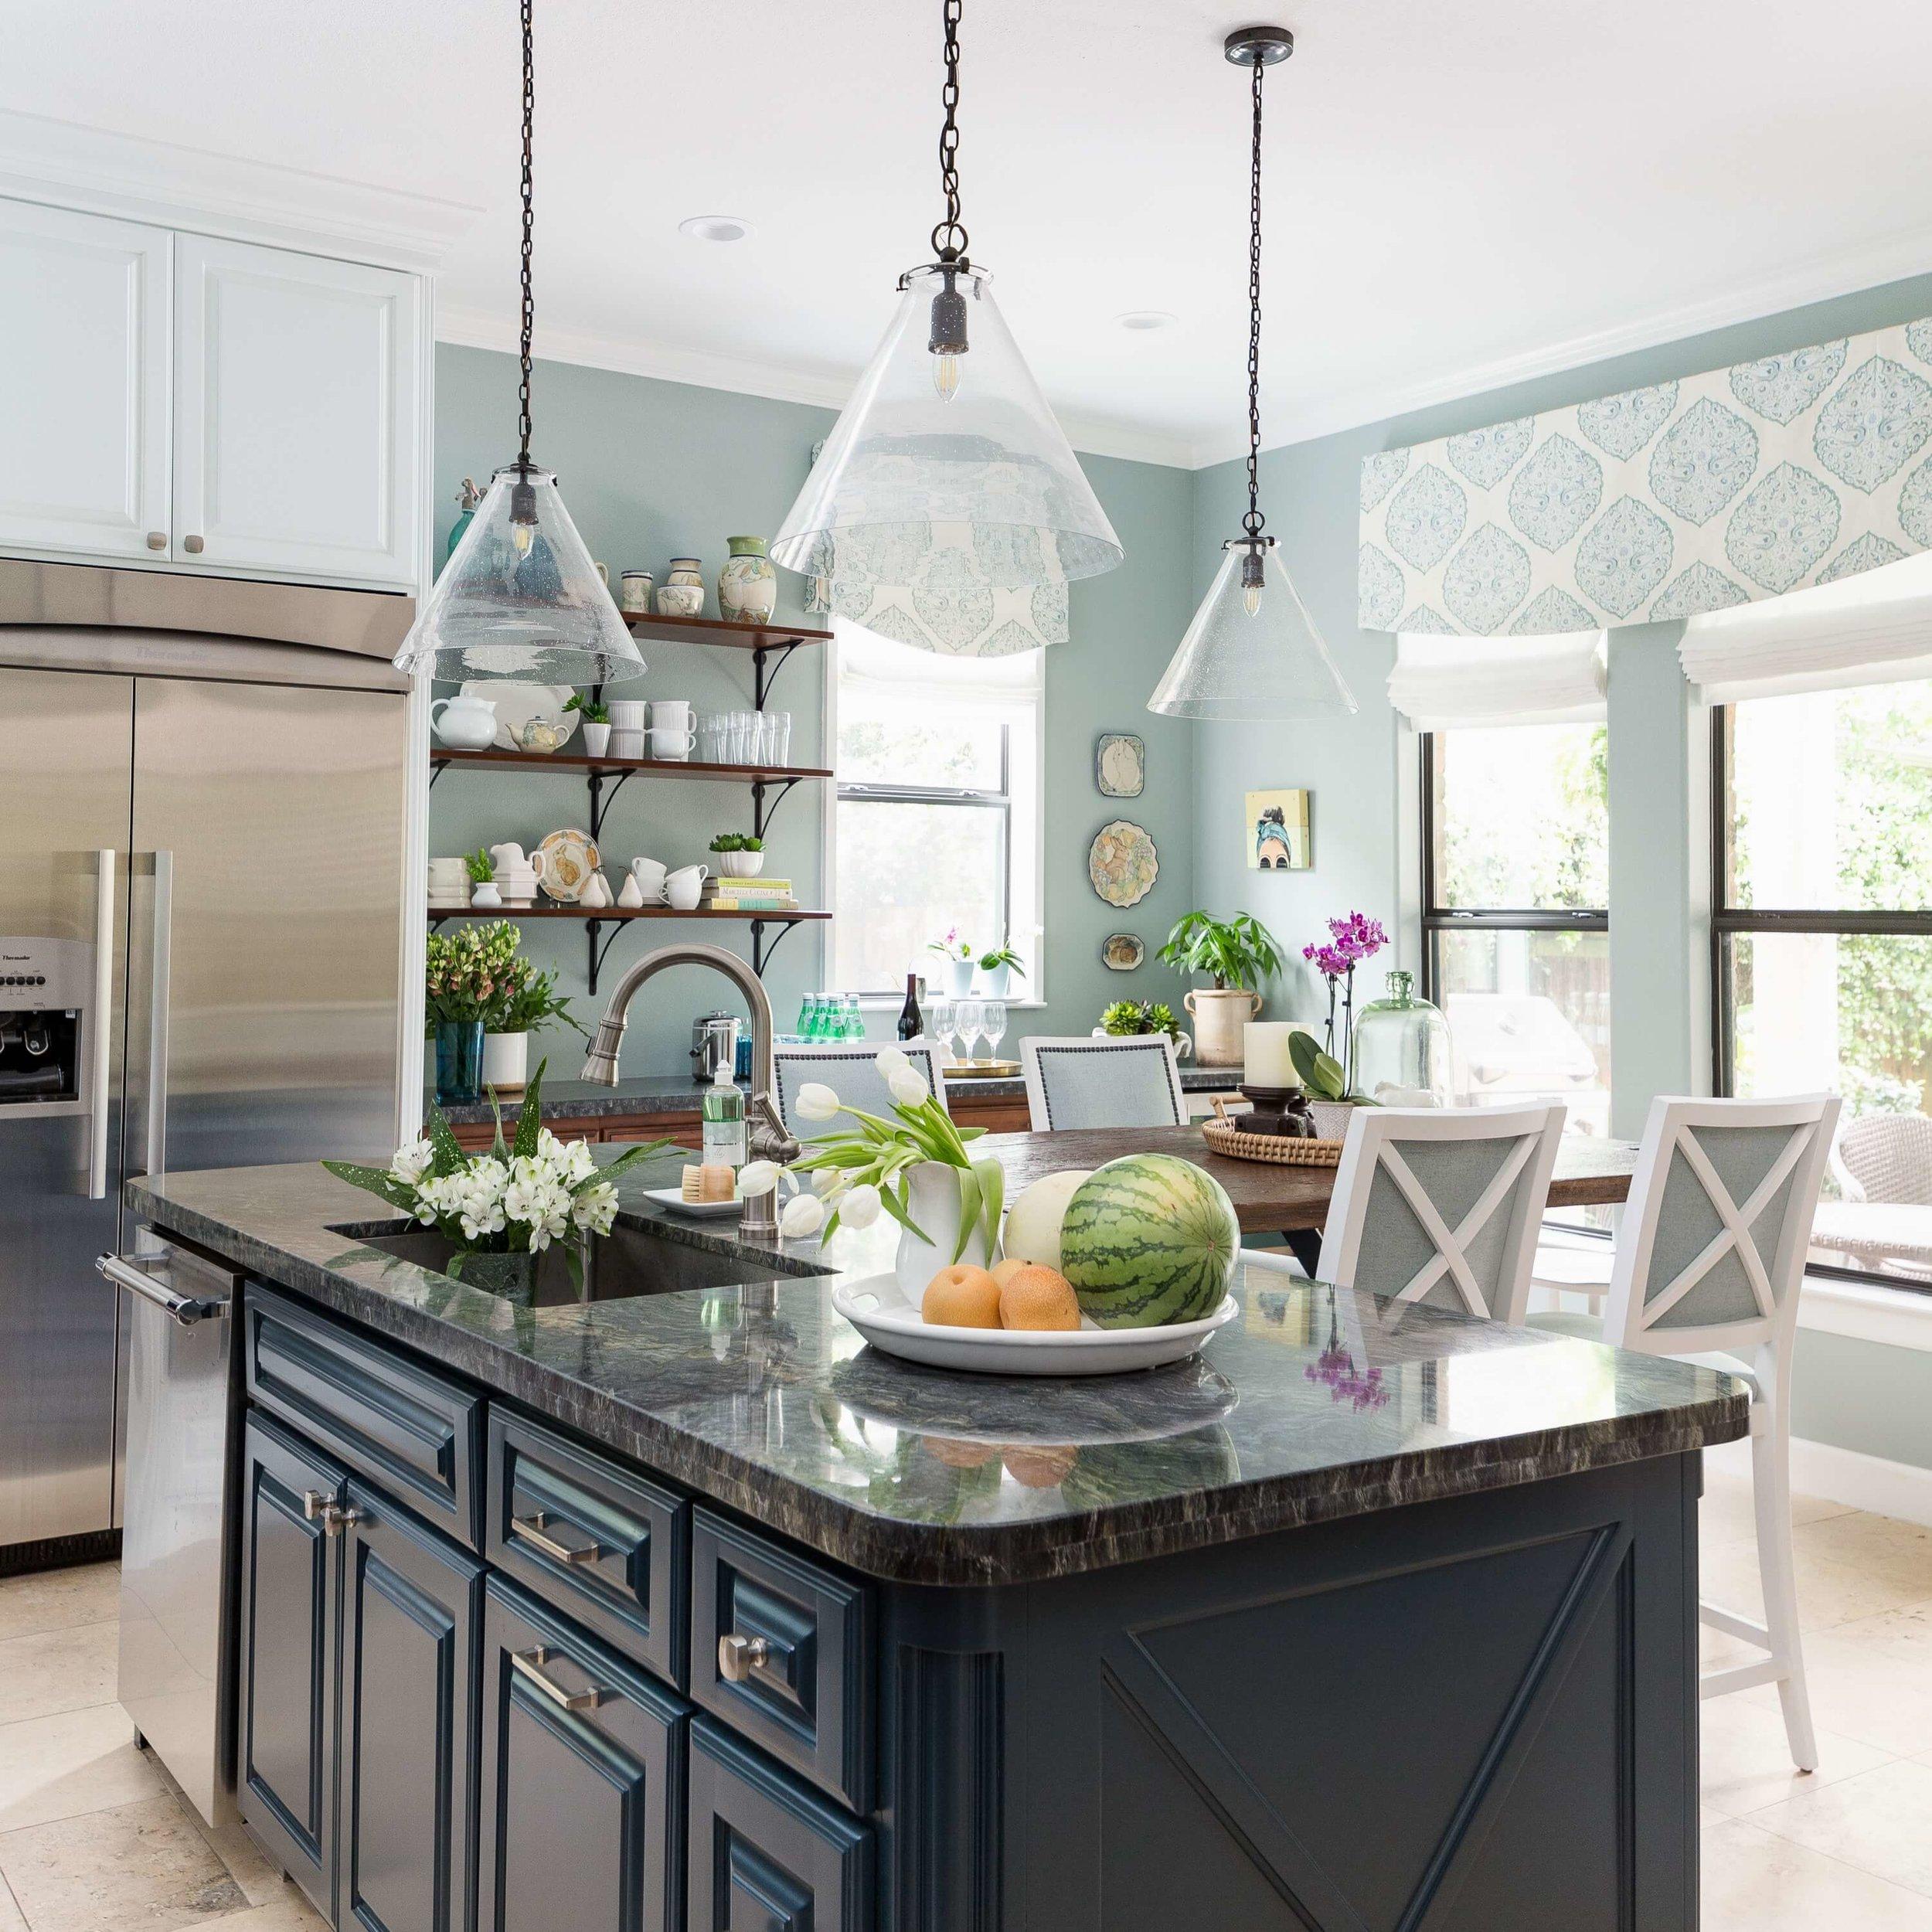 Window valances and Roman shades layer in softness in this coastal style kitchen. Carla Aston, Designer | Colleen Scott, Photographer #windowvalances #Romanshades #windowtreatments